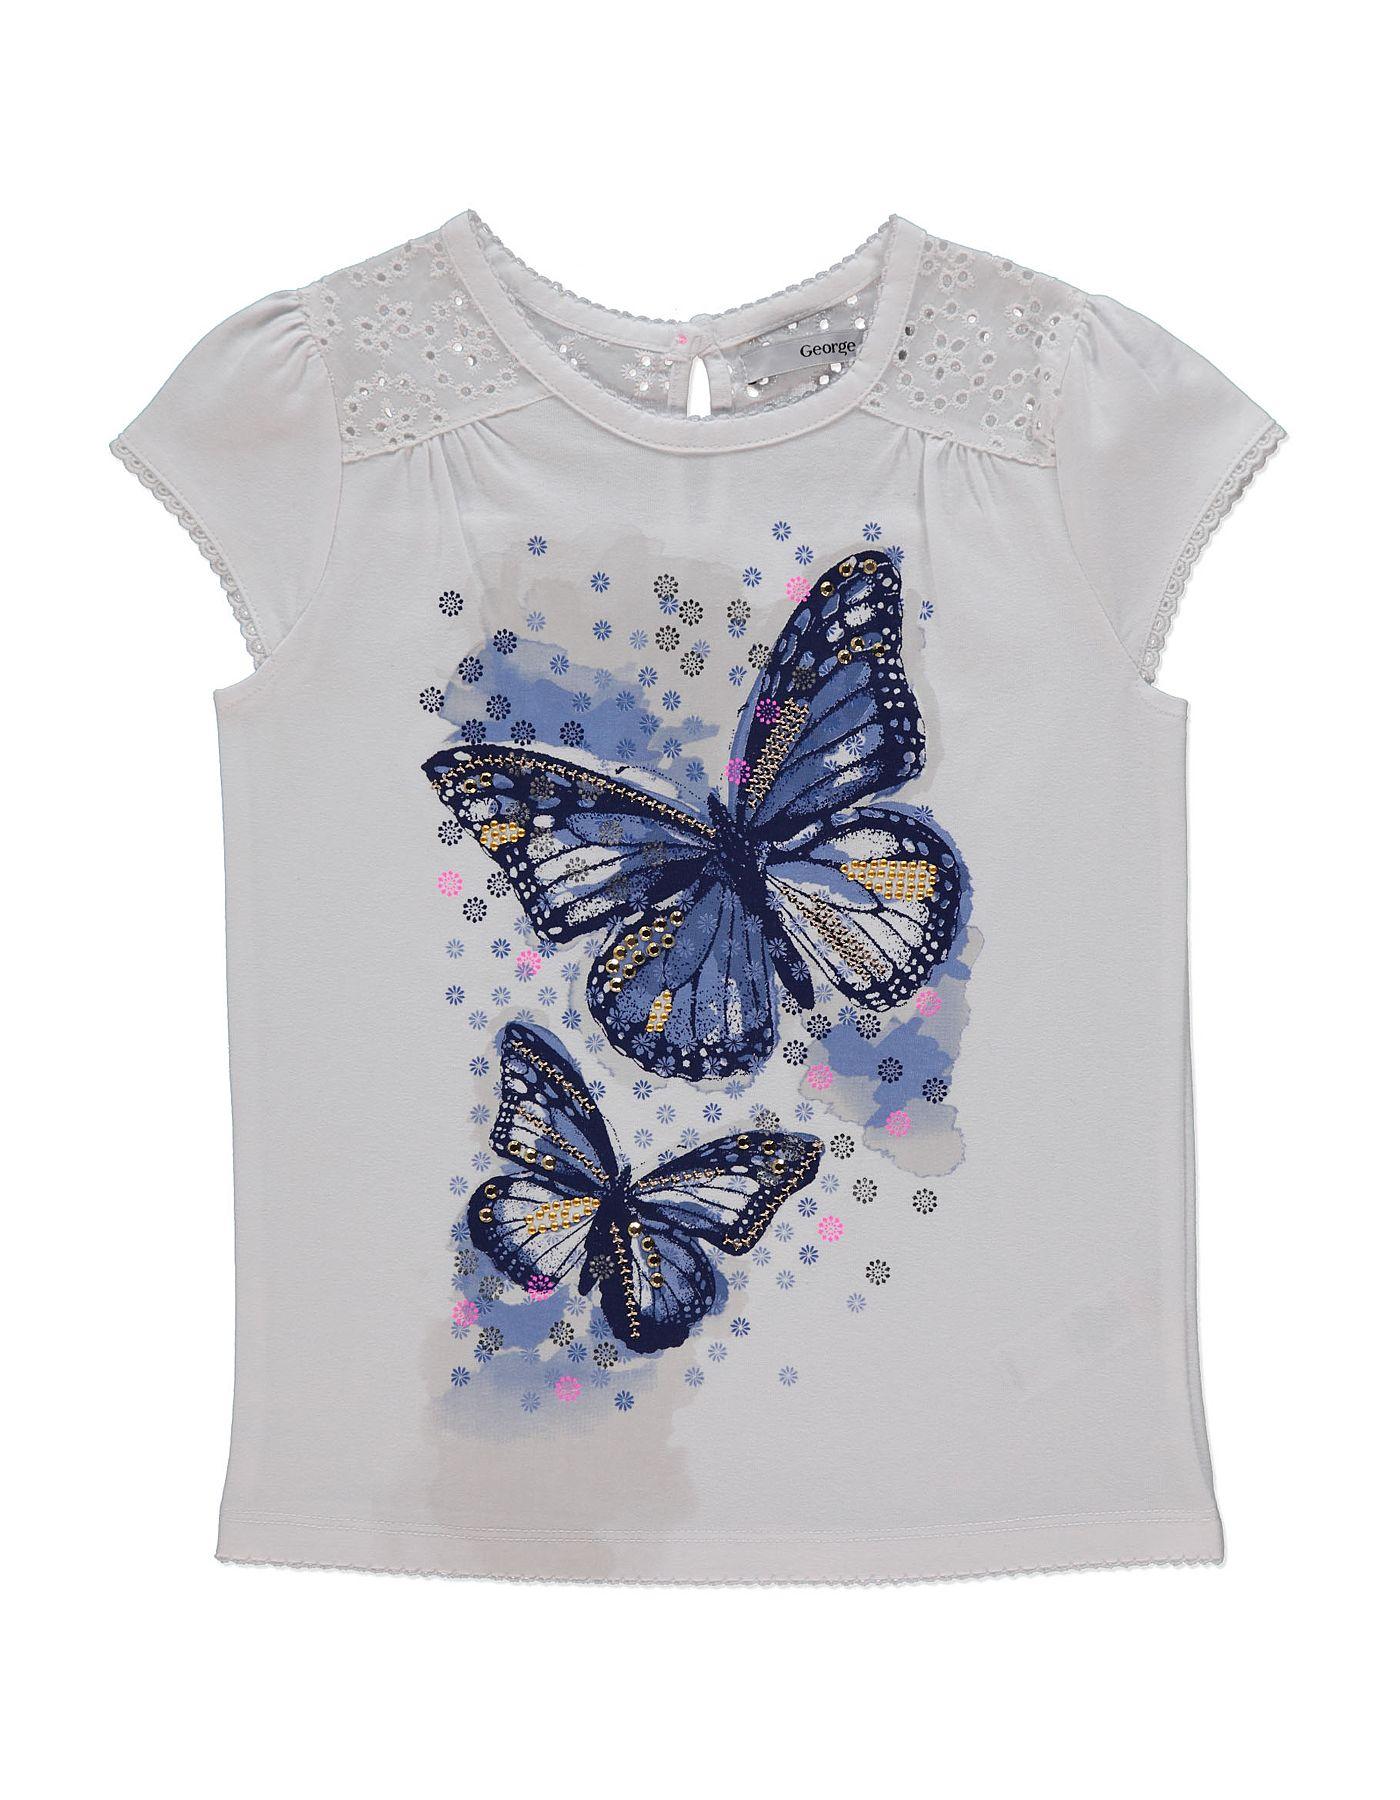 de29ef73 Butterfly Print T-shirt | Kids | George at ASDA | baby girl ...